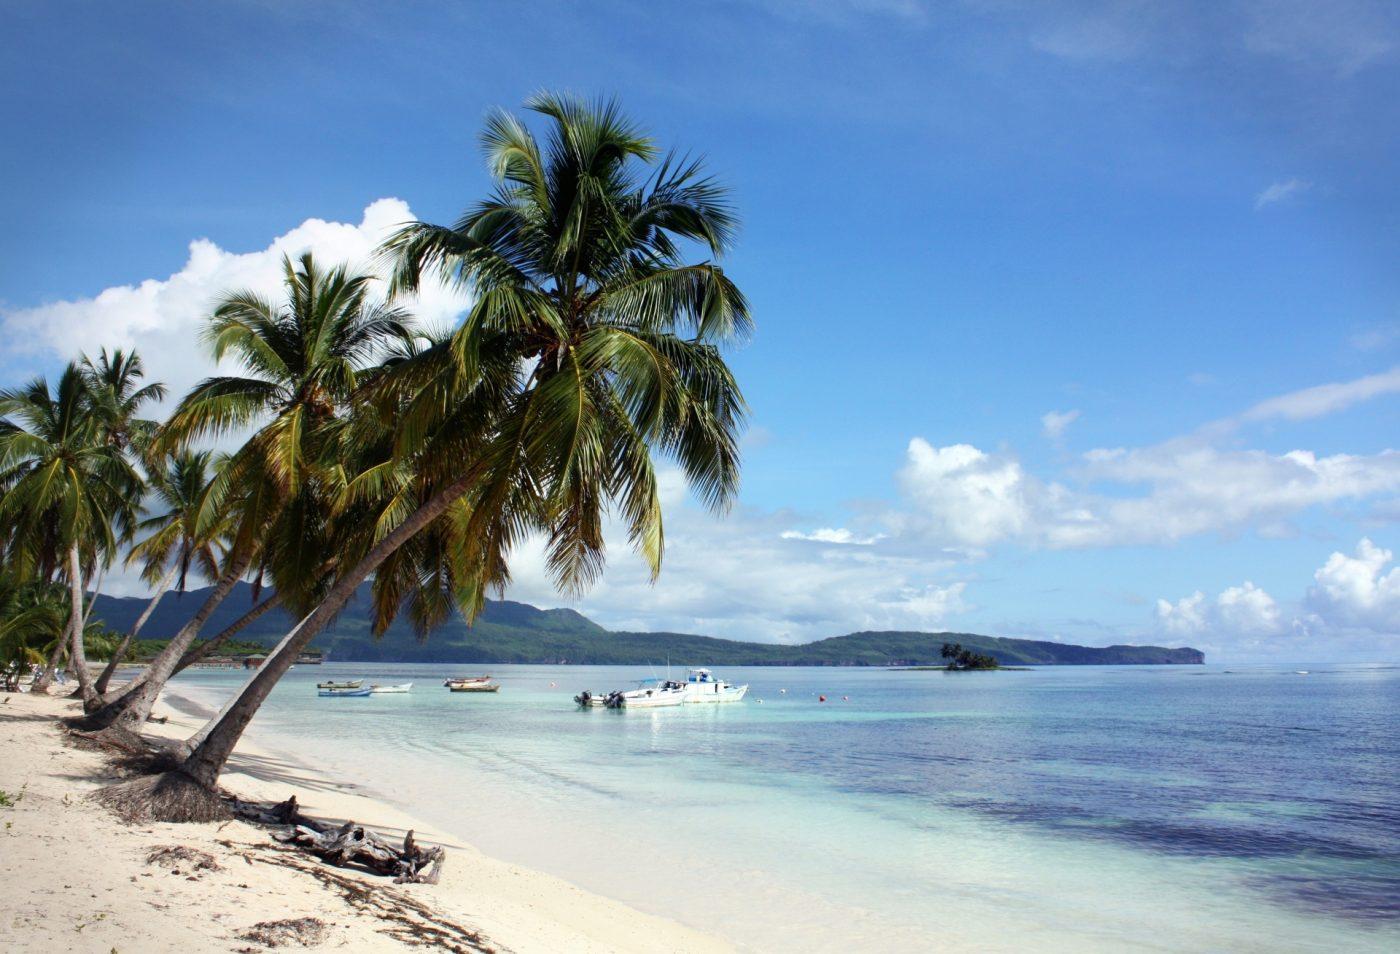 beach-in-las-galeras-samana-dominican-republic-boats